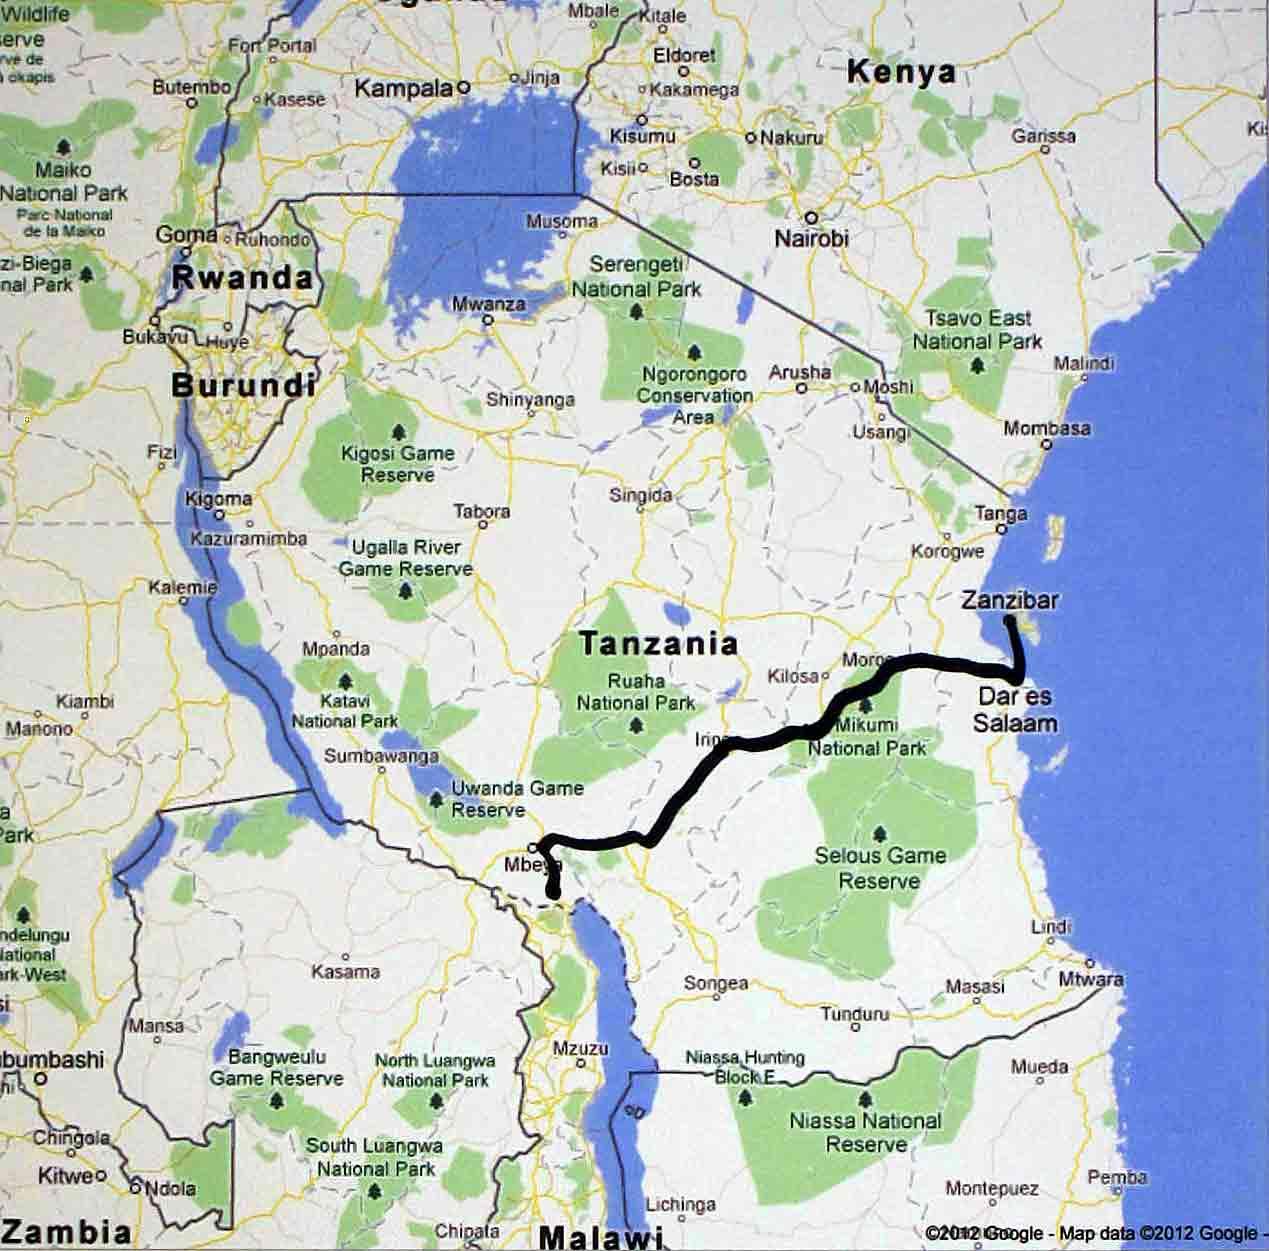 June 15 Dar es Salaam to Zanzibar